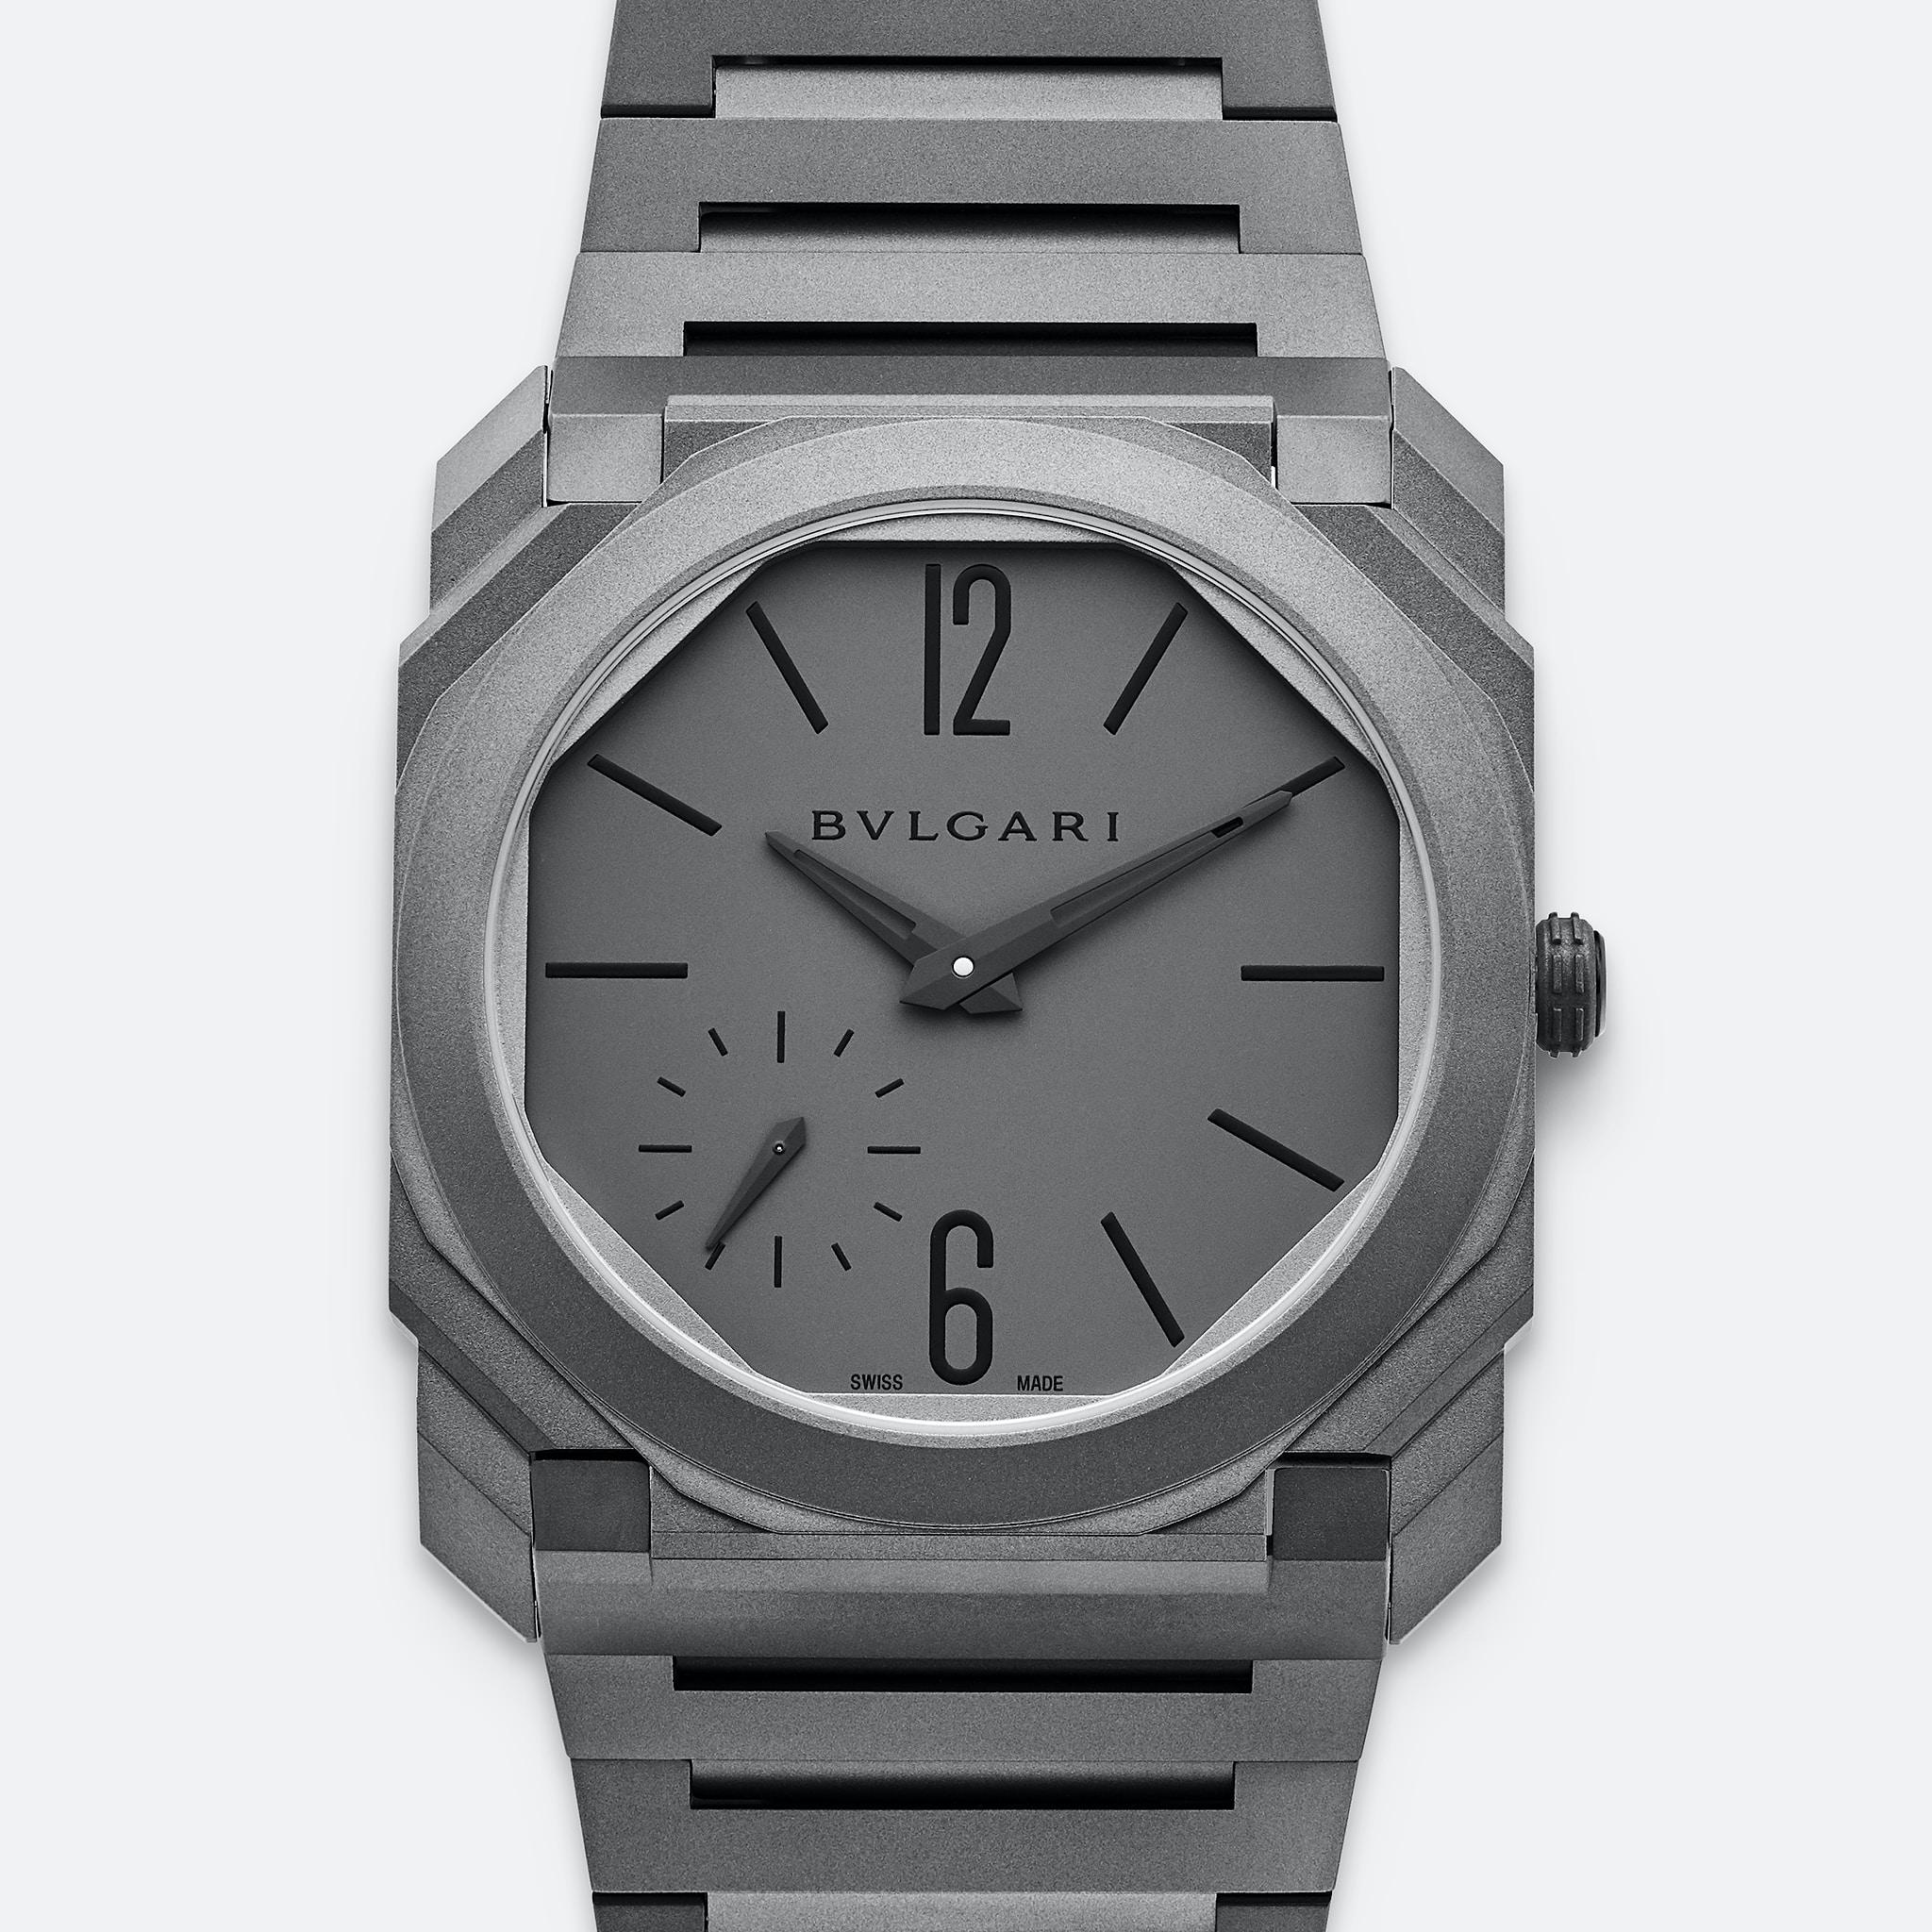 BVLGARI Octo Finissimo Automatic In Titanium With Bracelet – HODINKEE Shop